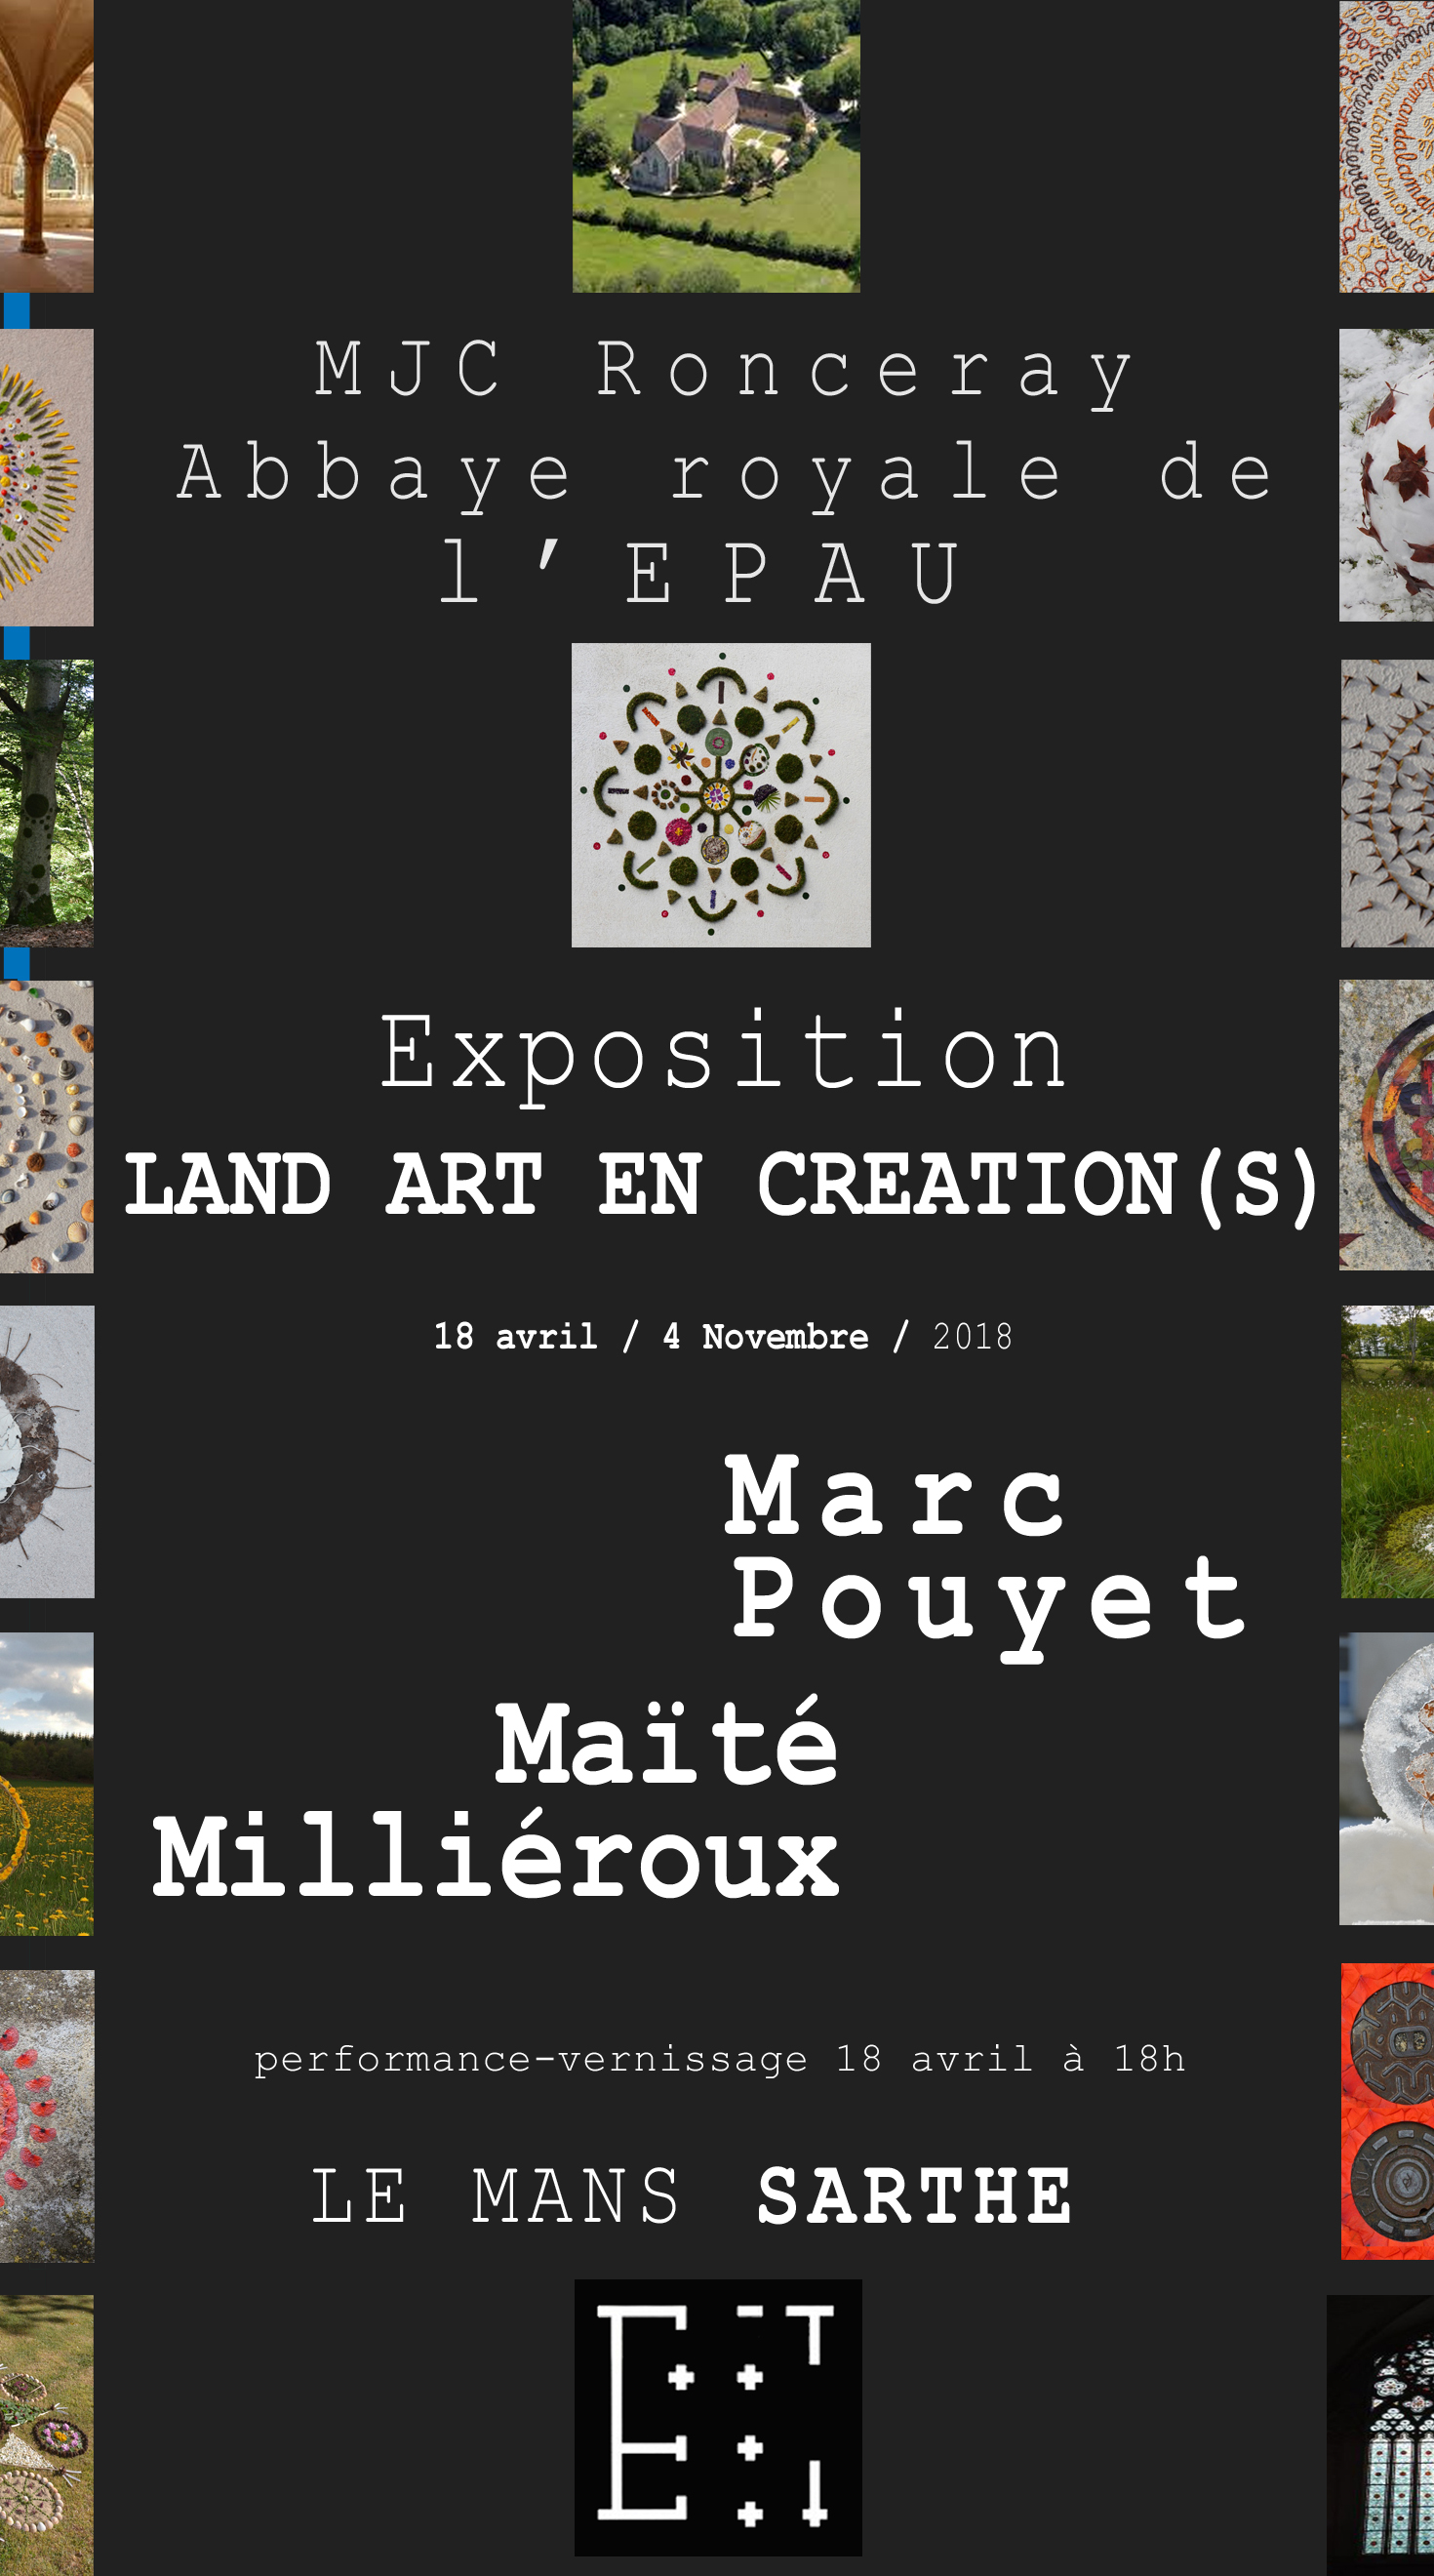 Article Exposition Abbaye de l'Epau 4